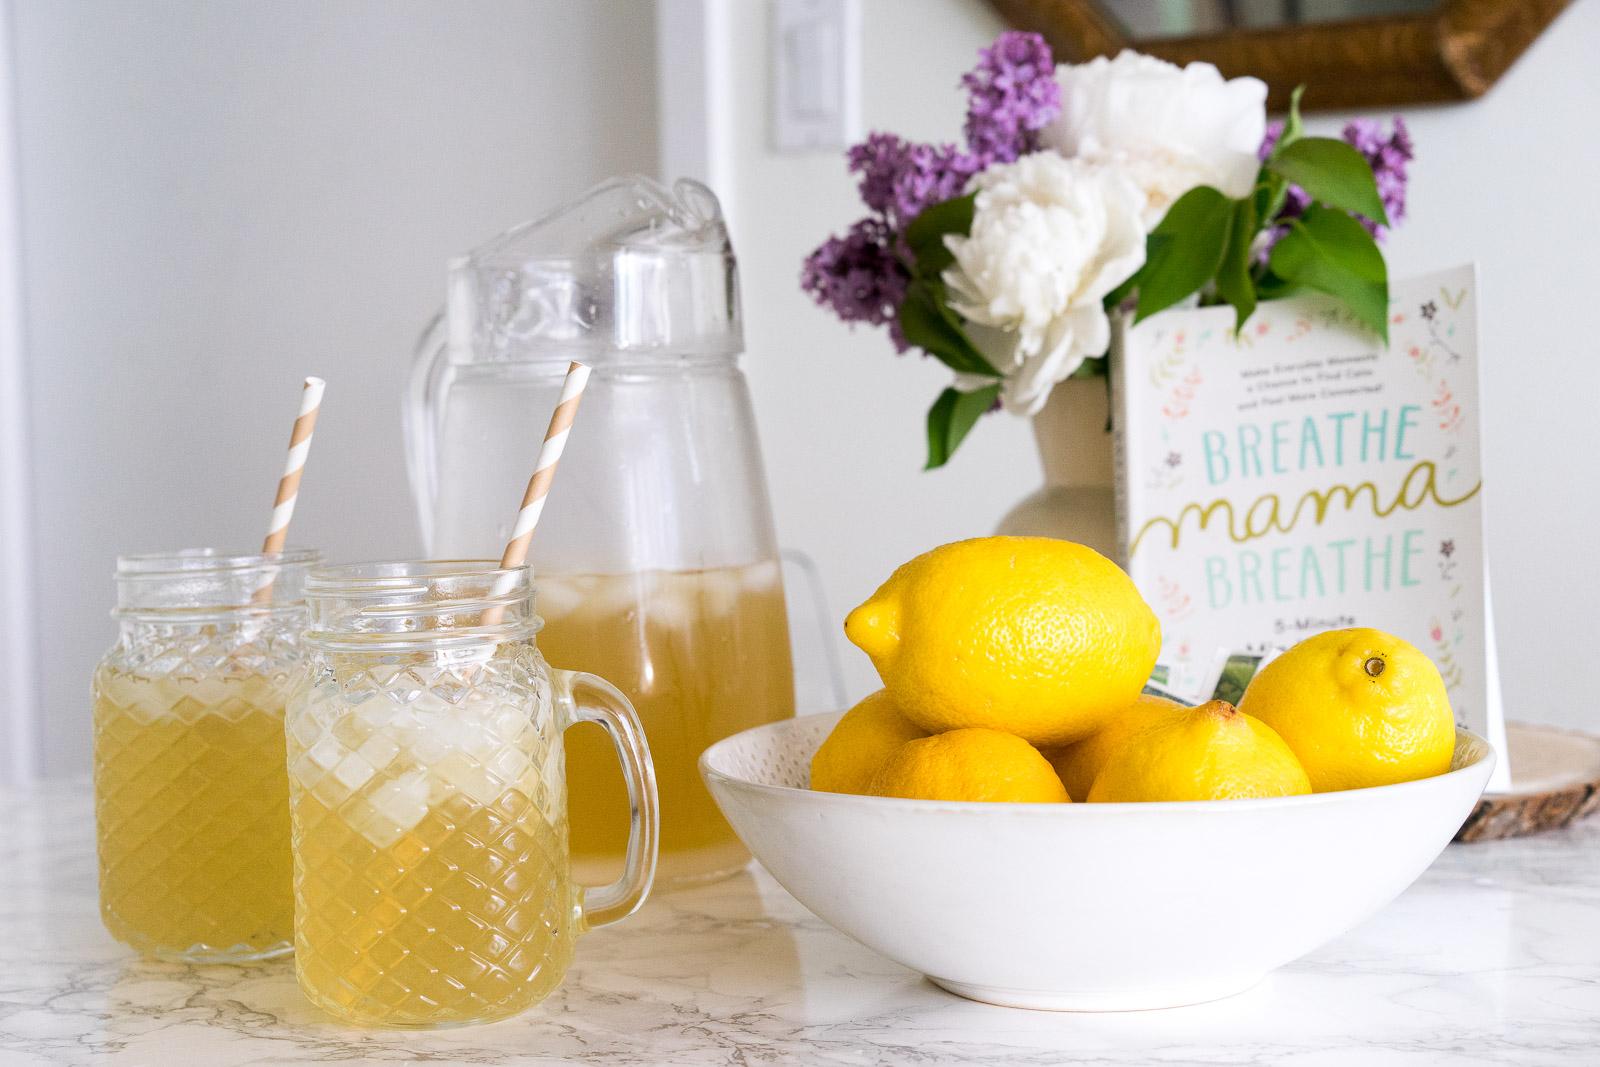 3rd-trimester-arnold-palmer-raspberry-leaf-tea-lemonade-recipe-5.jpg